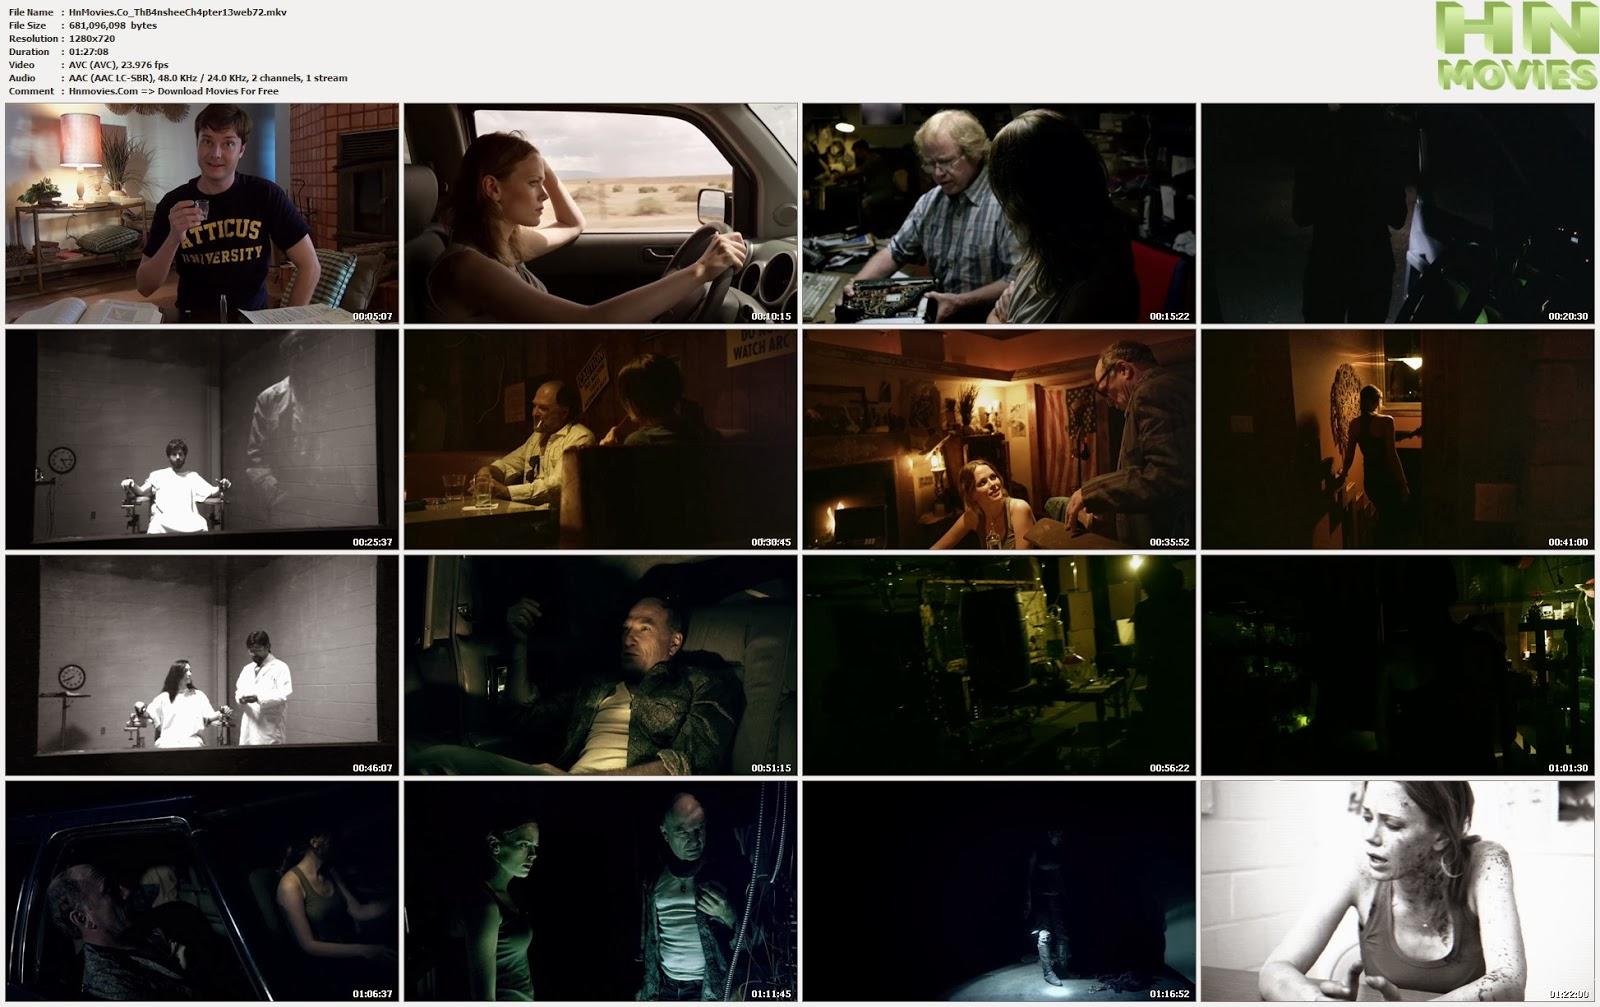 movie screenshot of The Banshee Chapter fdmovie.com